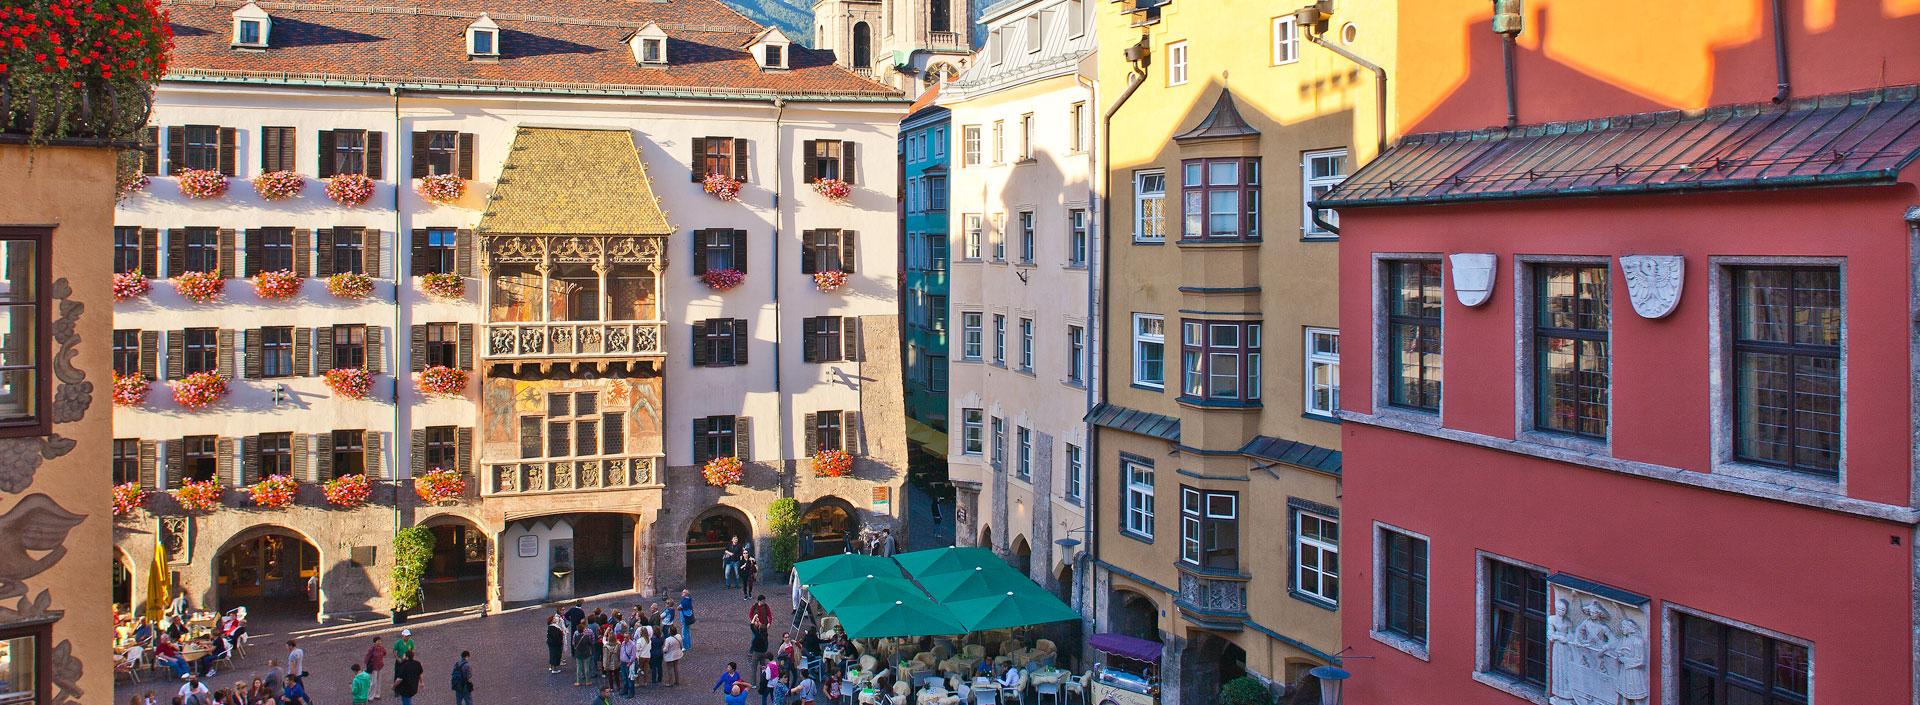 Sightseeing Highlights Innsbruck Patsch Tirol österreich